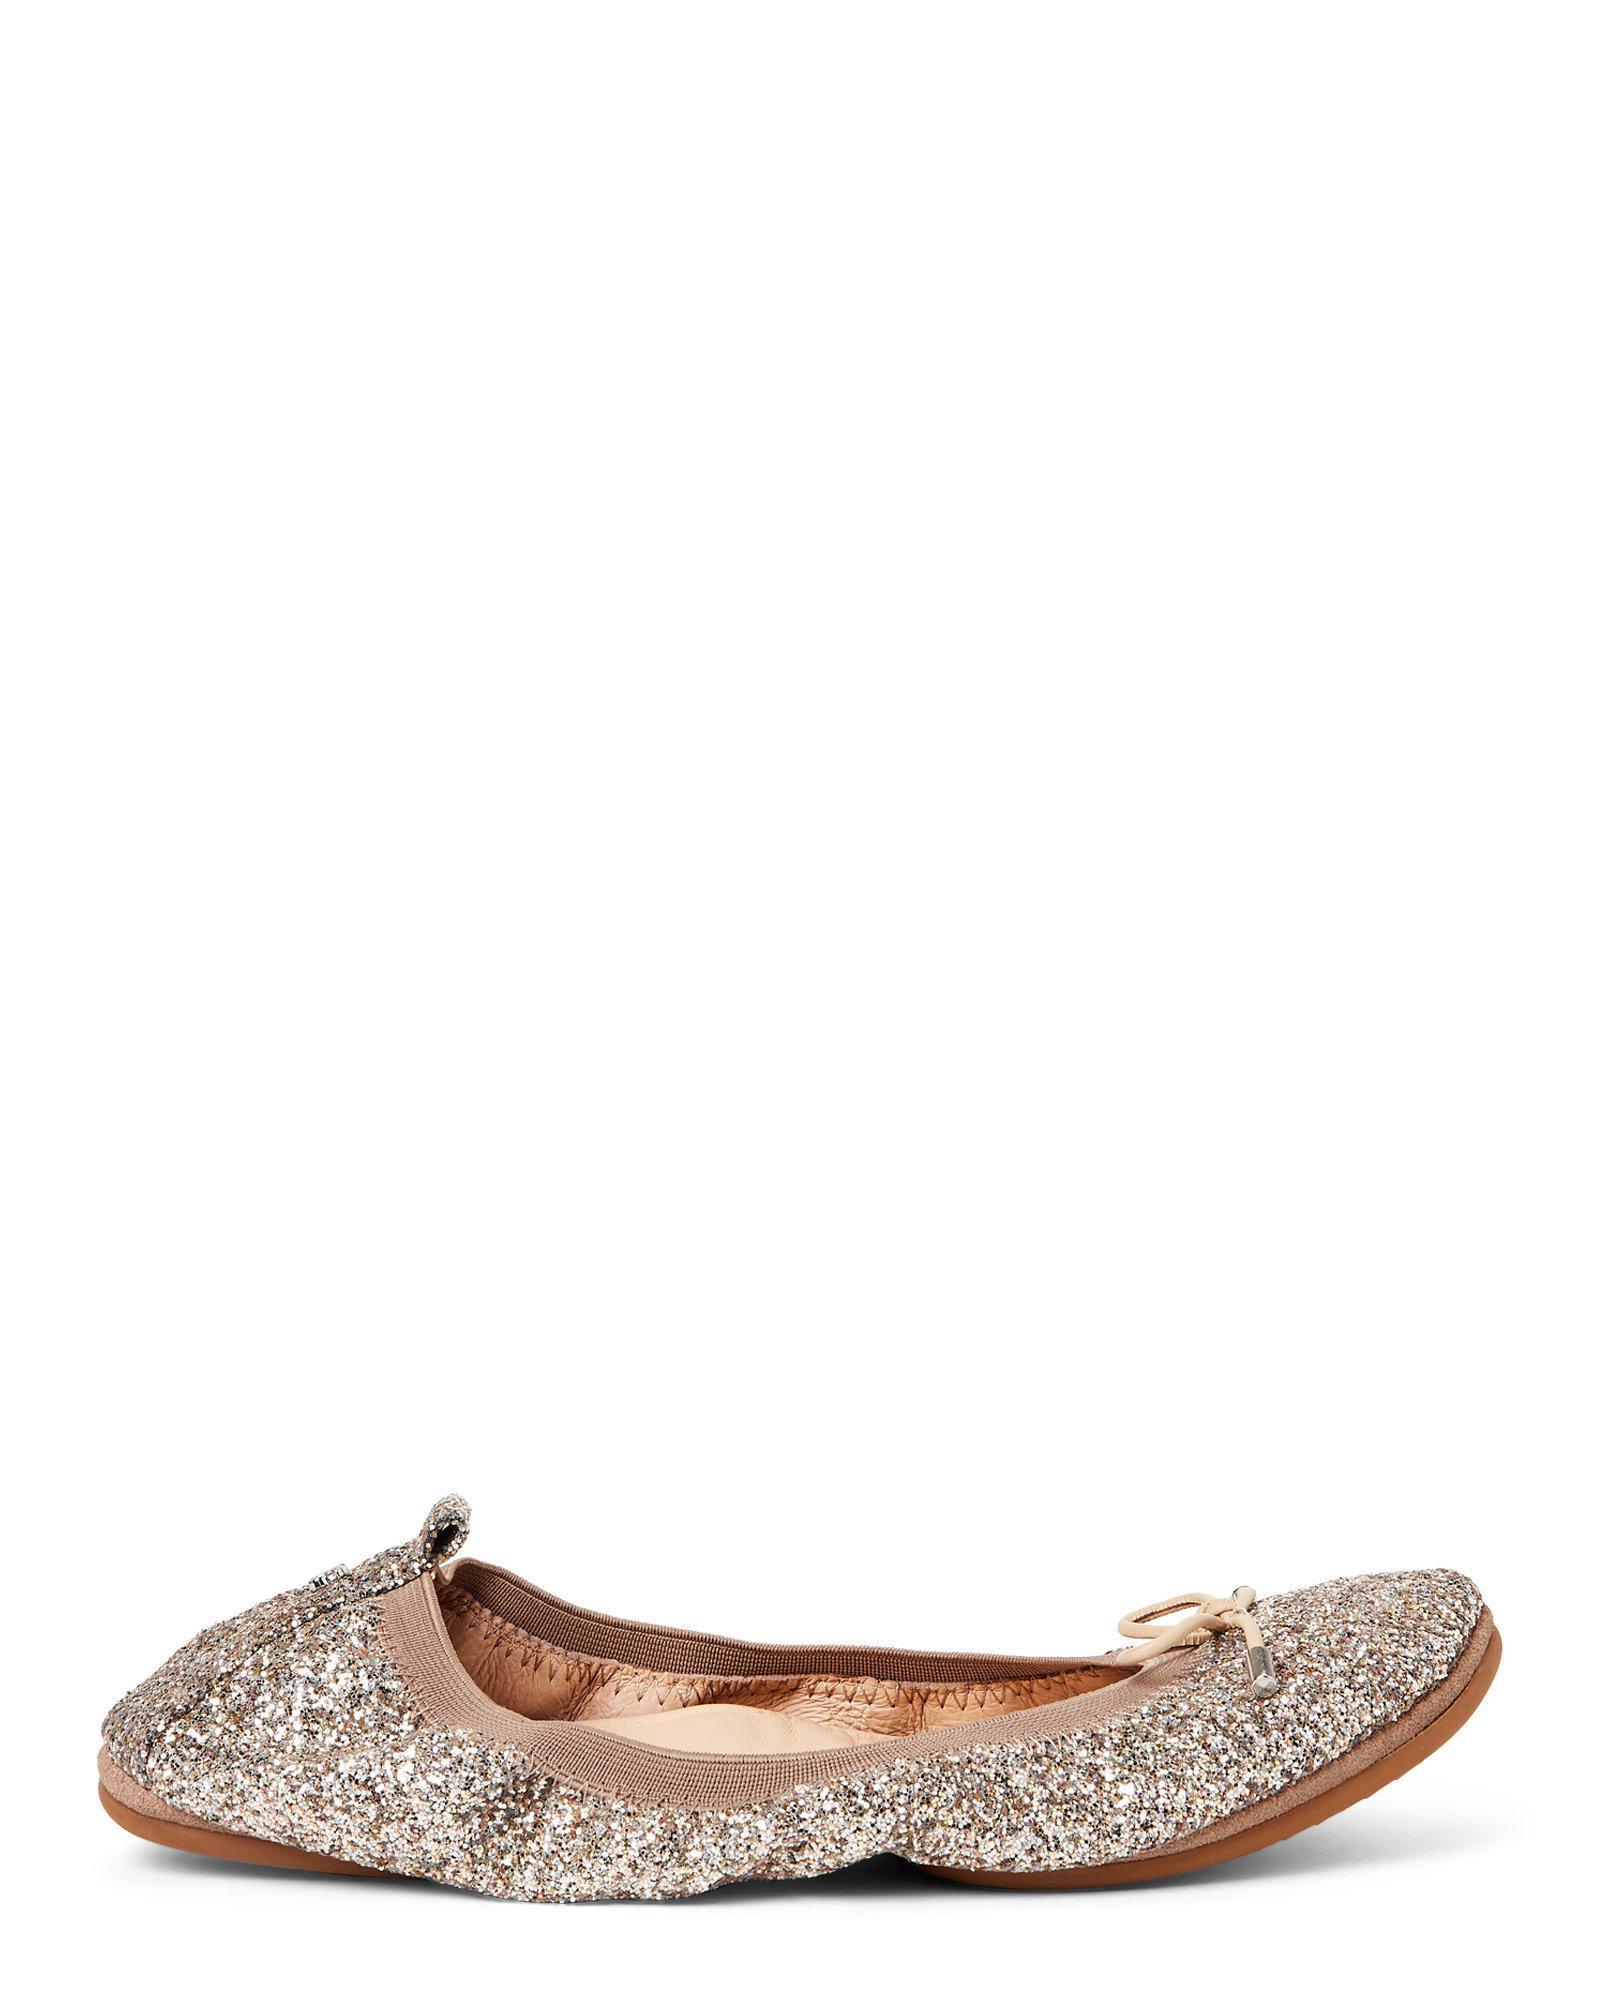 61dc2f977a96 Lyst - Yosi Samra Champagne Sandrine Glitter Ballet Flats